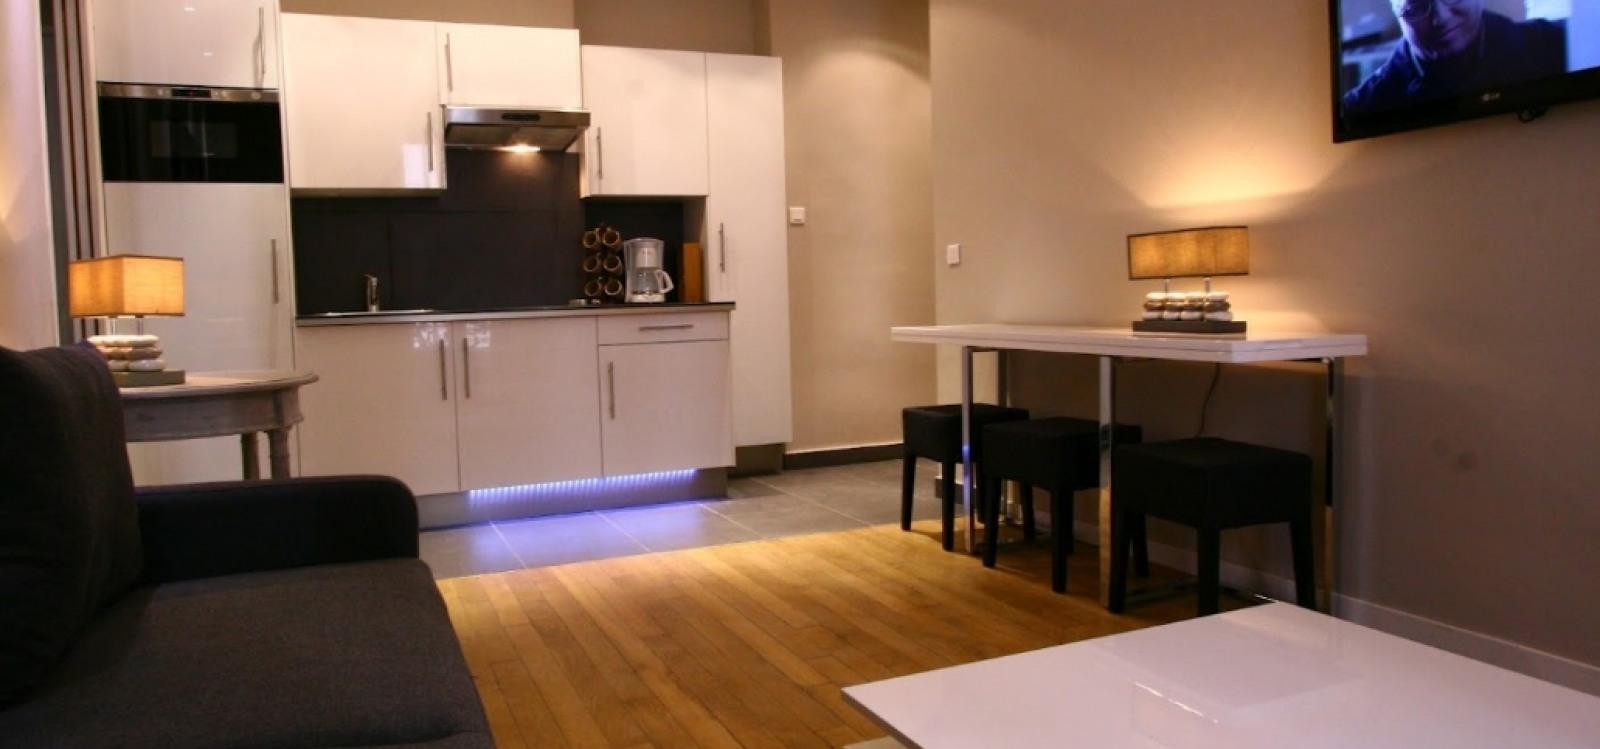 Hotel Convention Montparnasse - Appartements